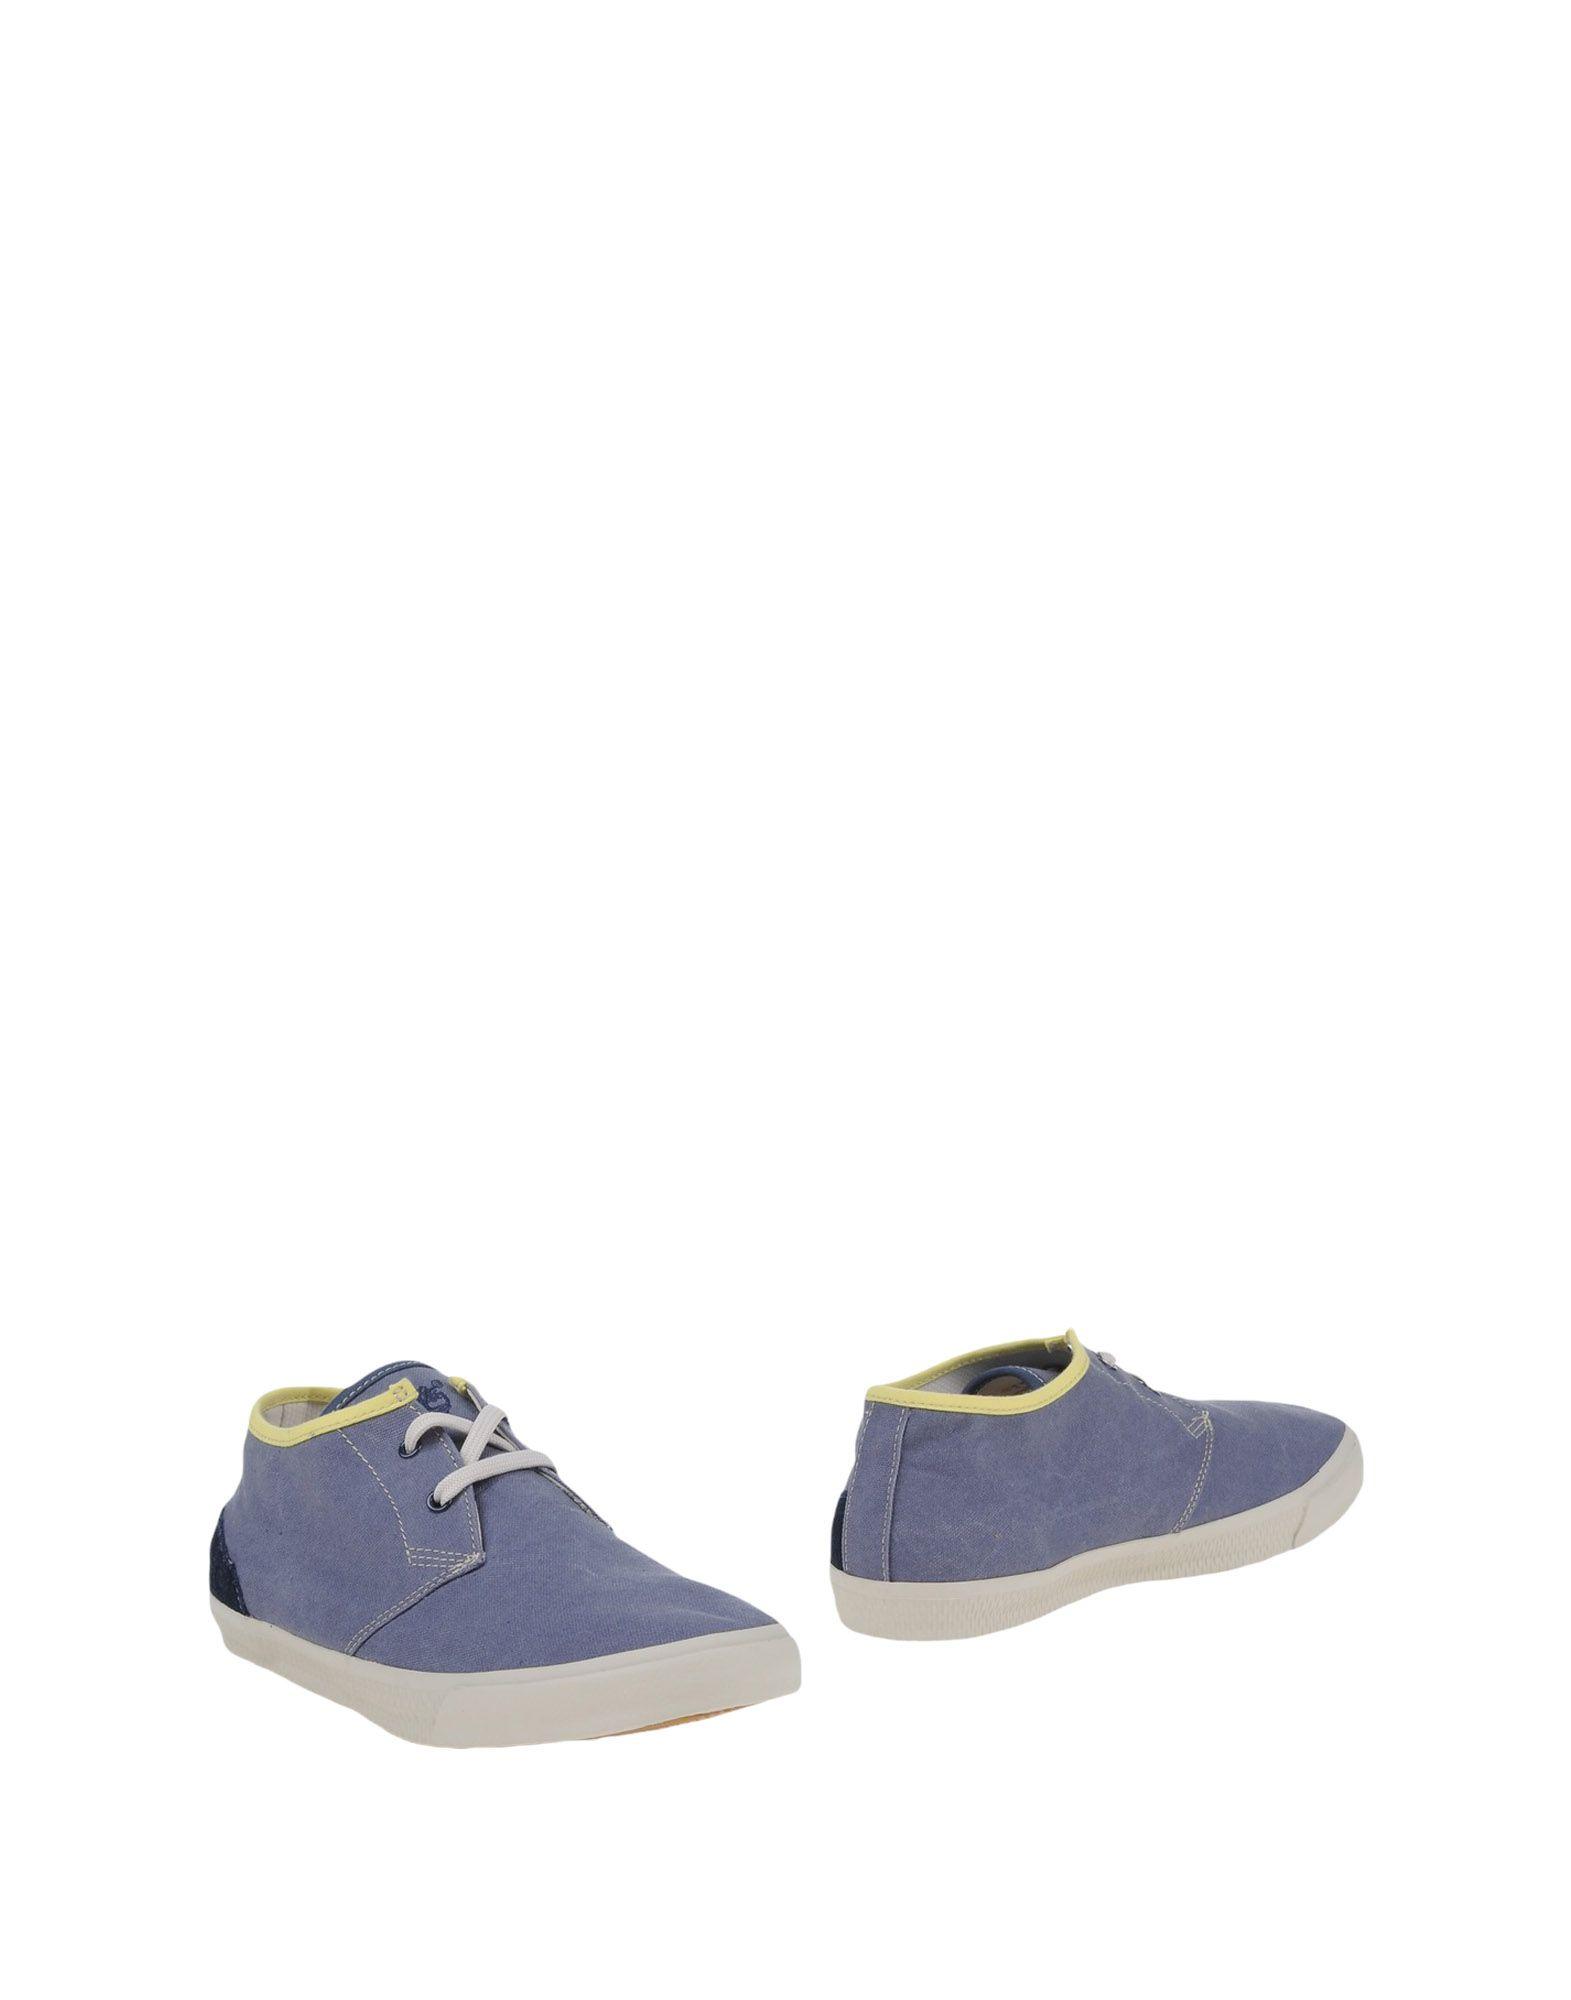 TIMBERLAND Полусапоги и высокие ботинки ботинки swims ботинки без каблука